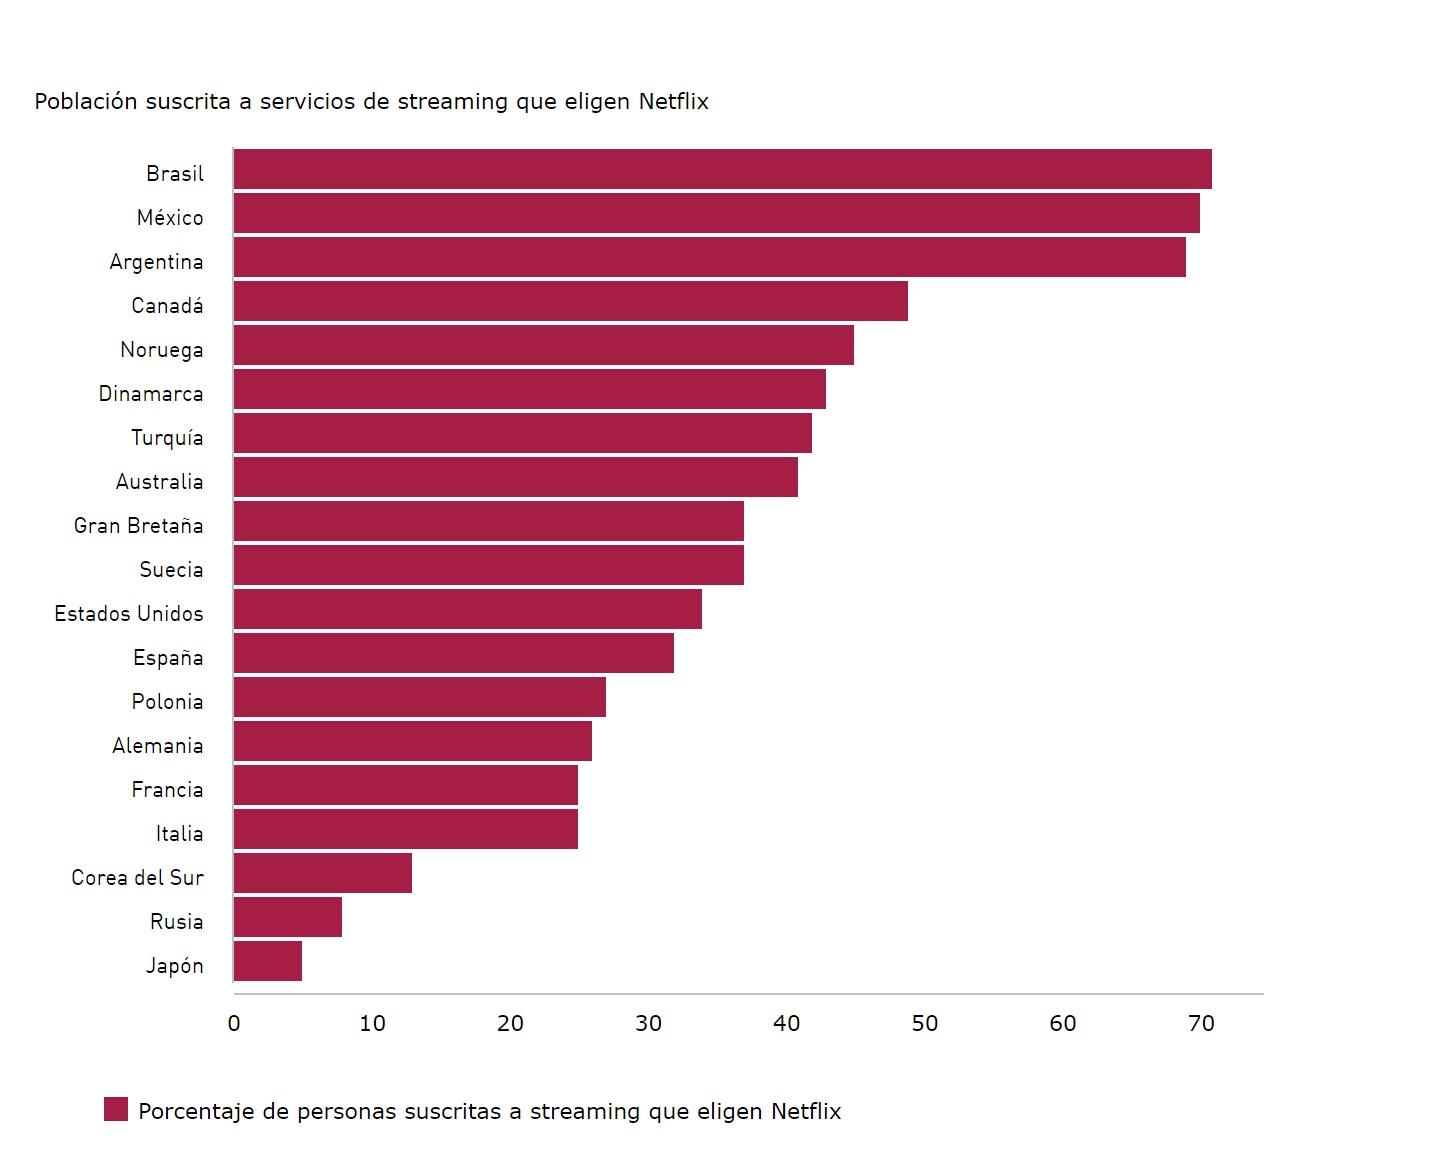 https://www.programapublicidad.com/wp-content/uploads/2019/07/ranking-paises-streaming-porcentaje-eligen-netflix-número-suscritos-países-europeos-kantar-programapublicidad-muy-grande.jpg